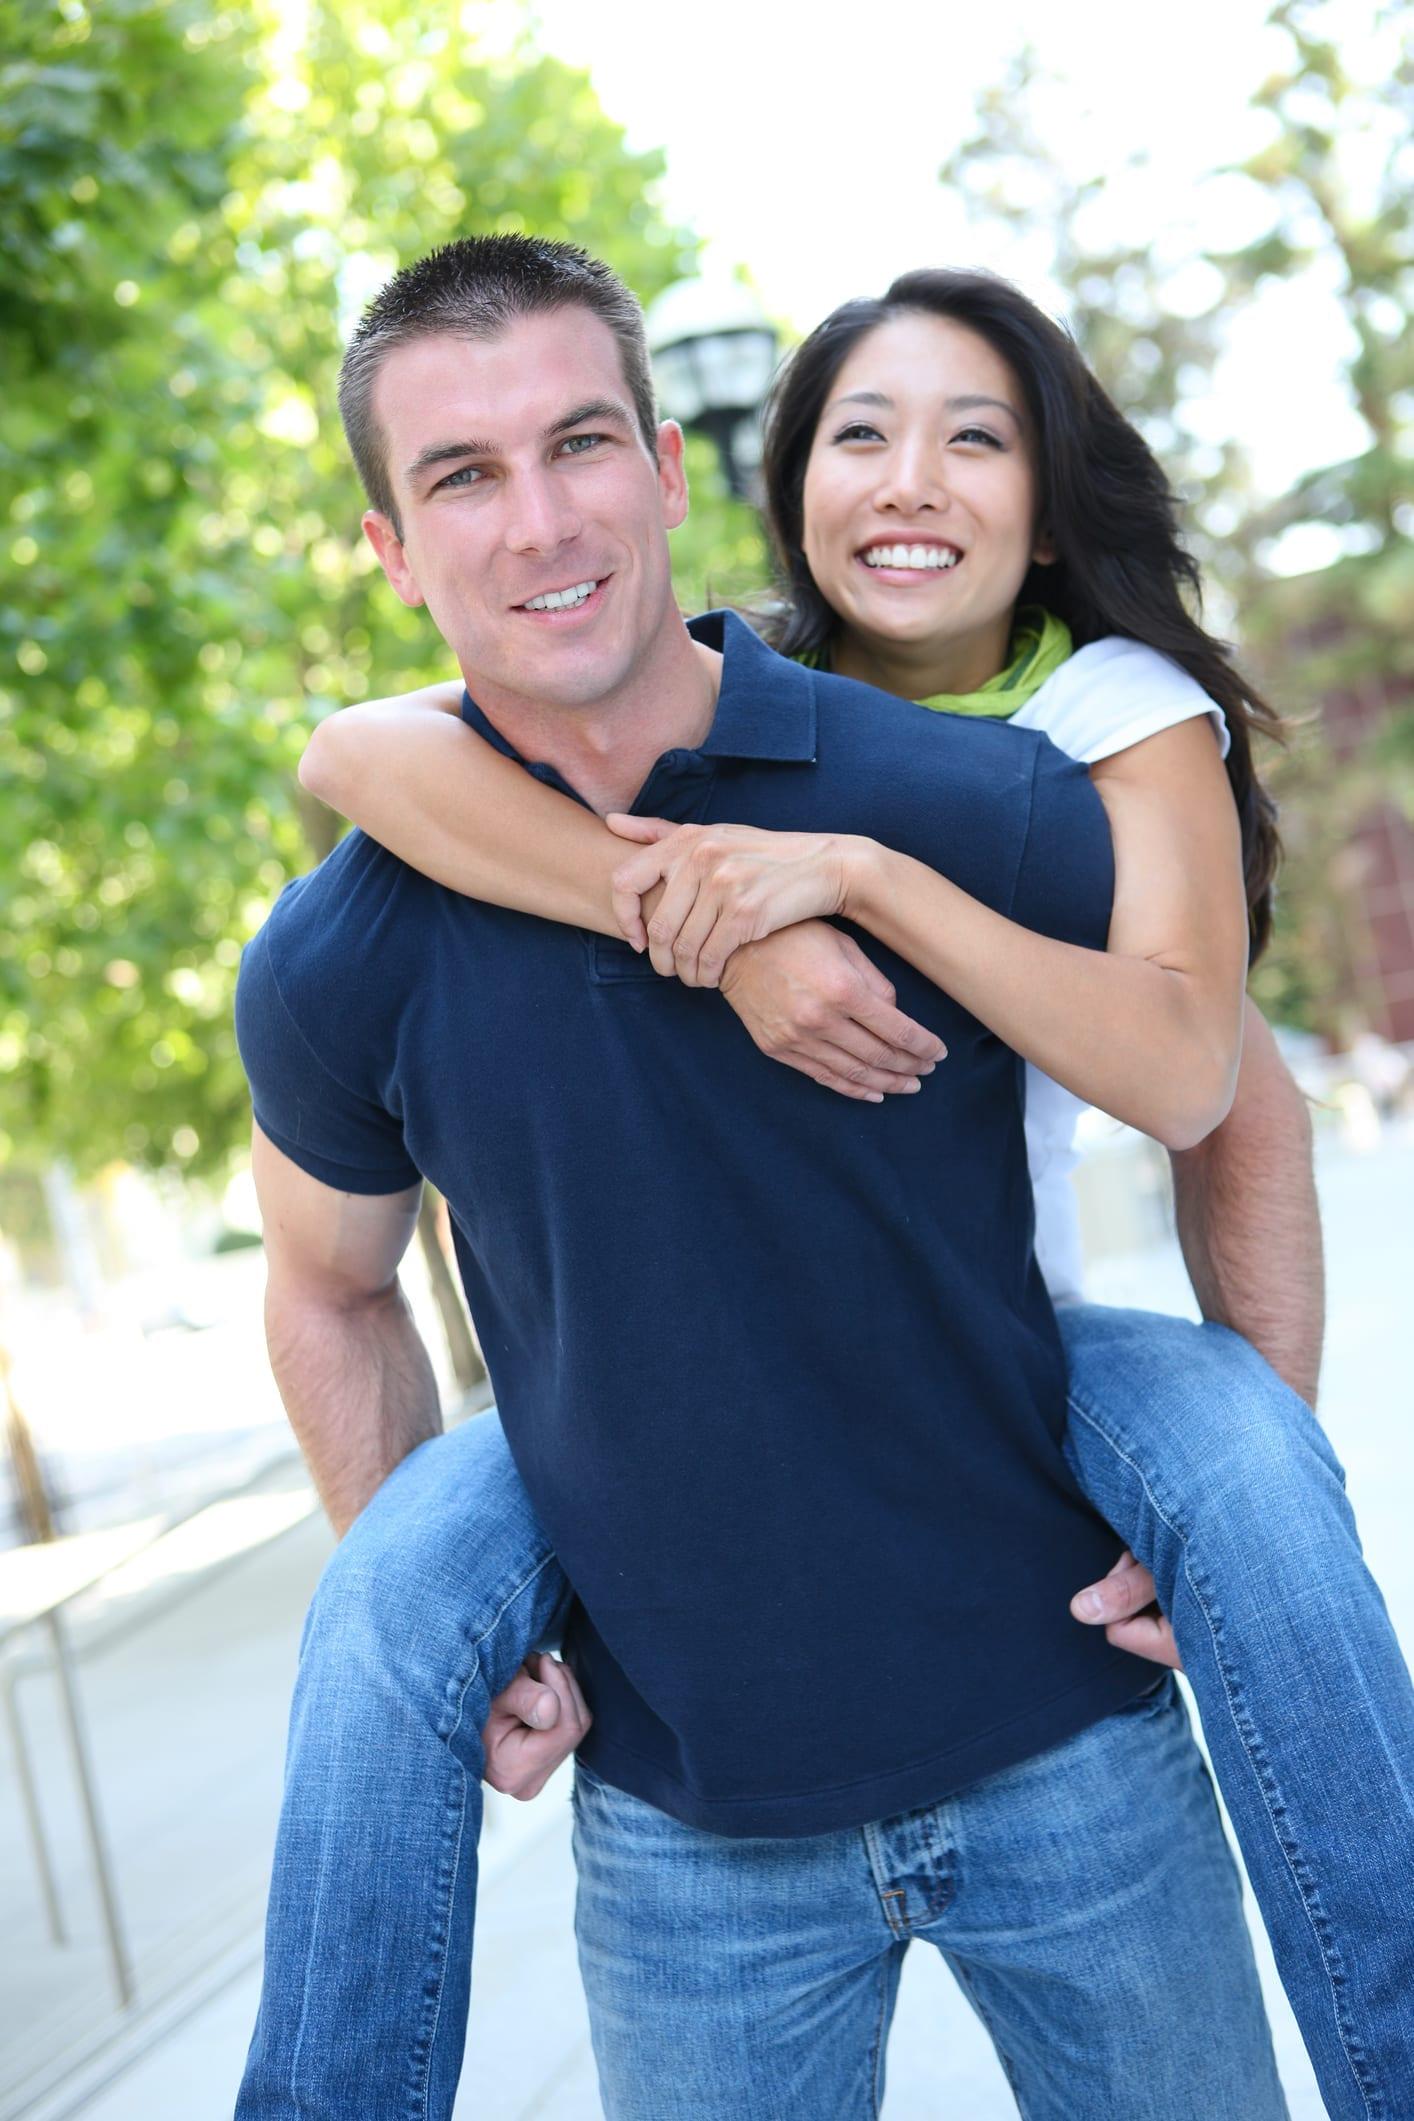 Fiance holding fiancee